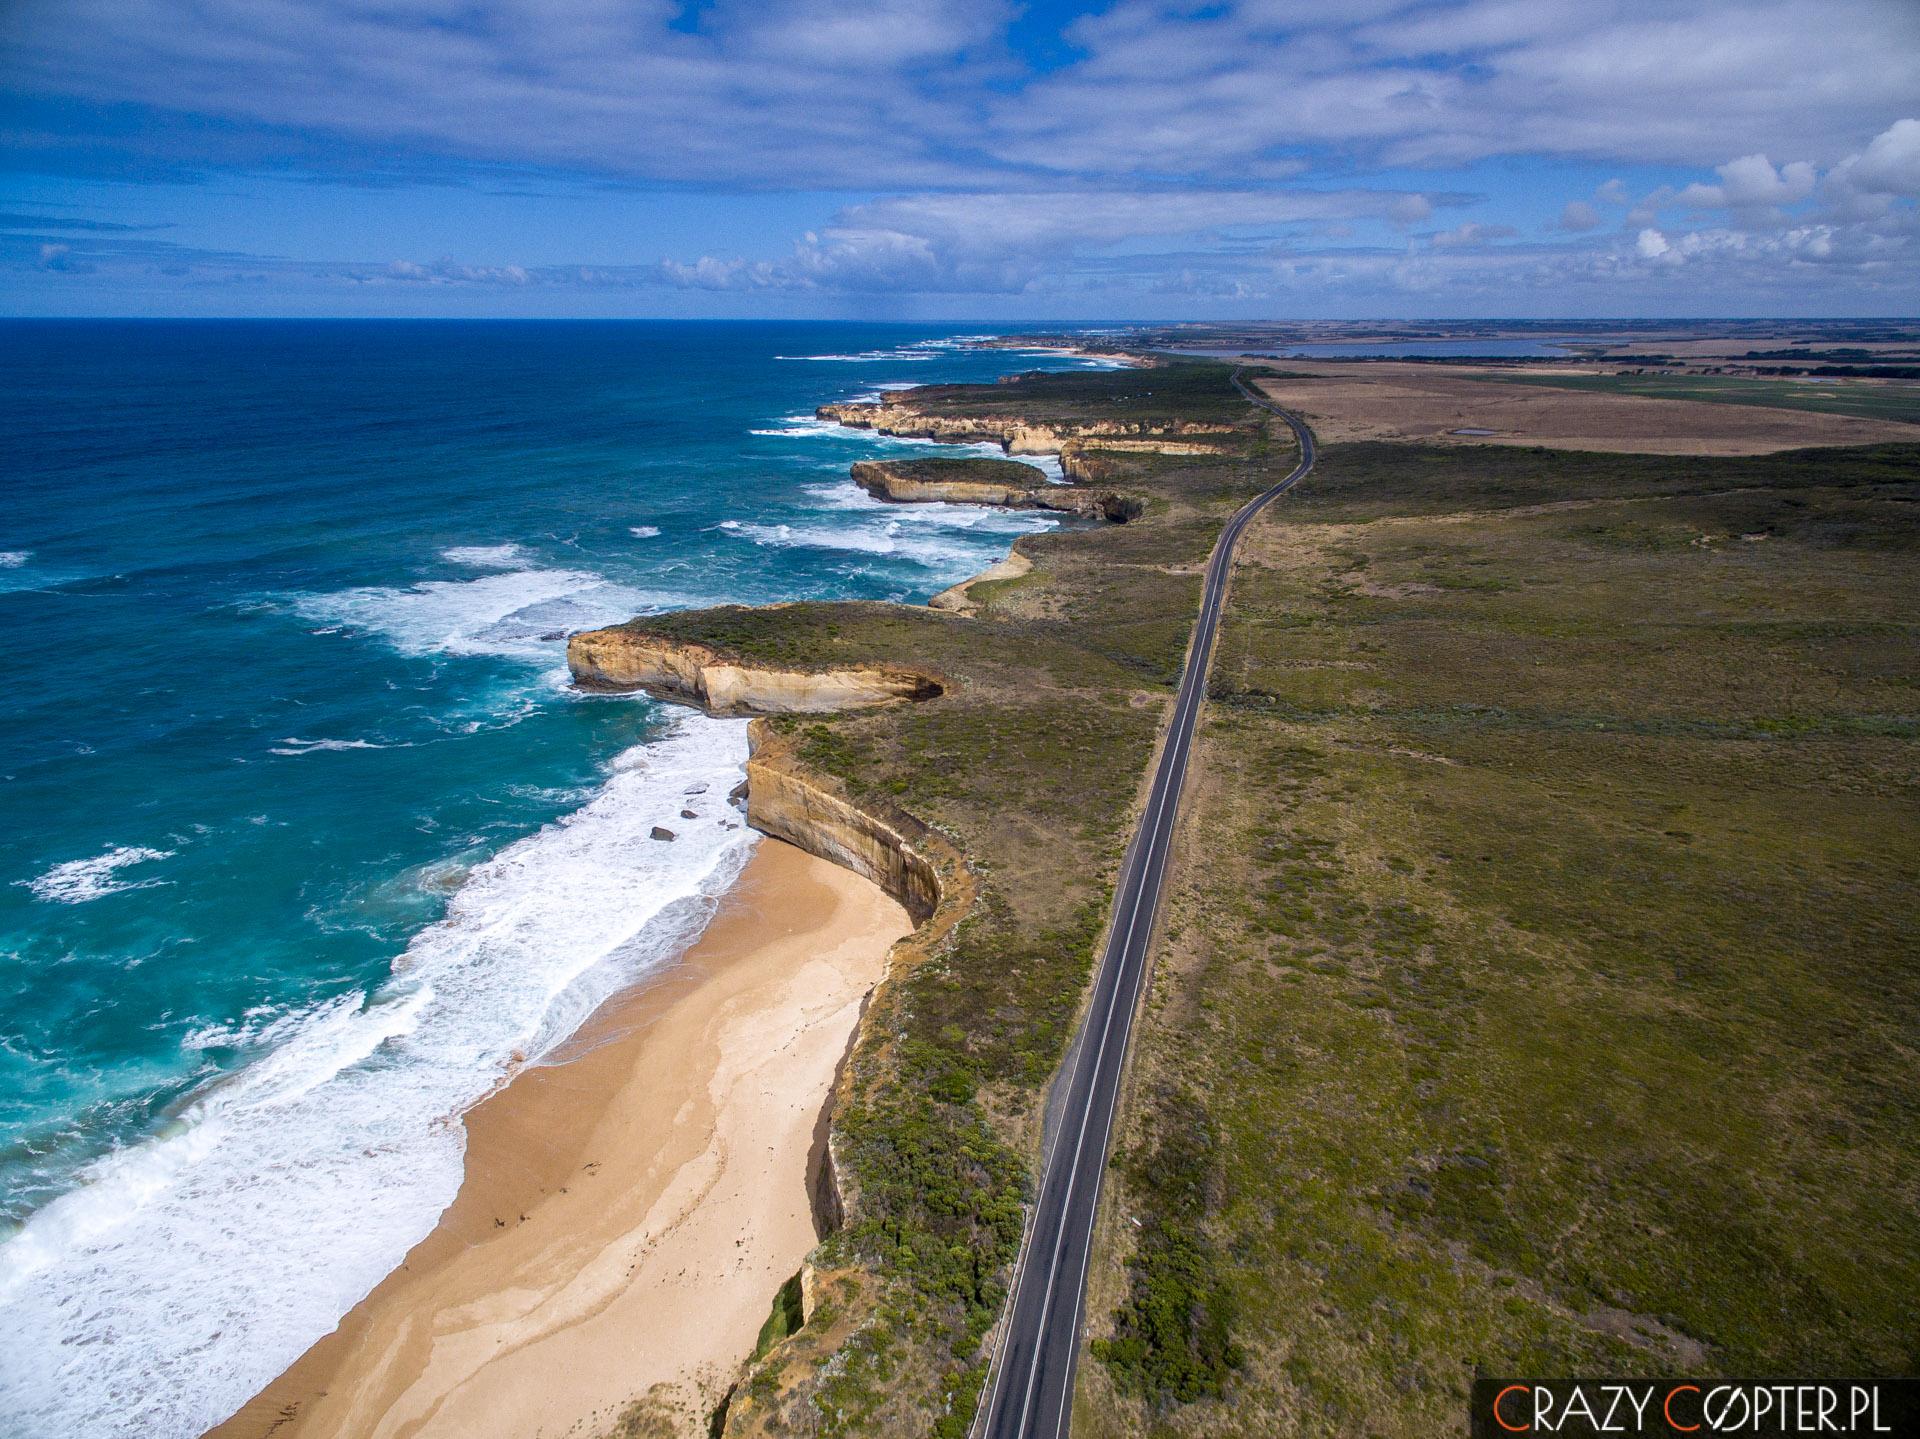 Zdjęcia zdrona Great Ocean Road, Australia